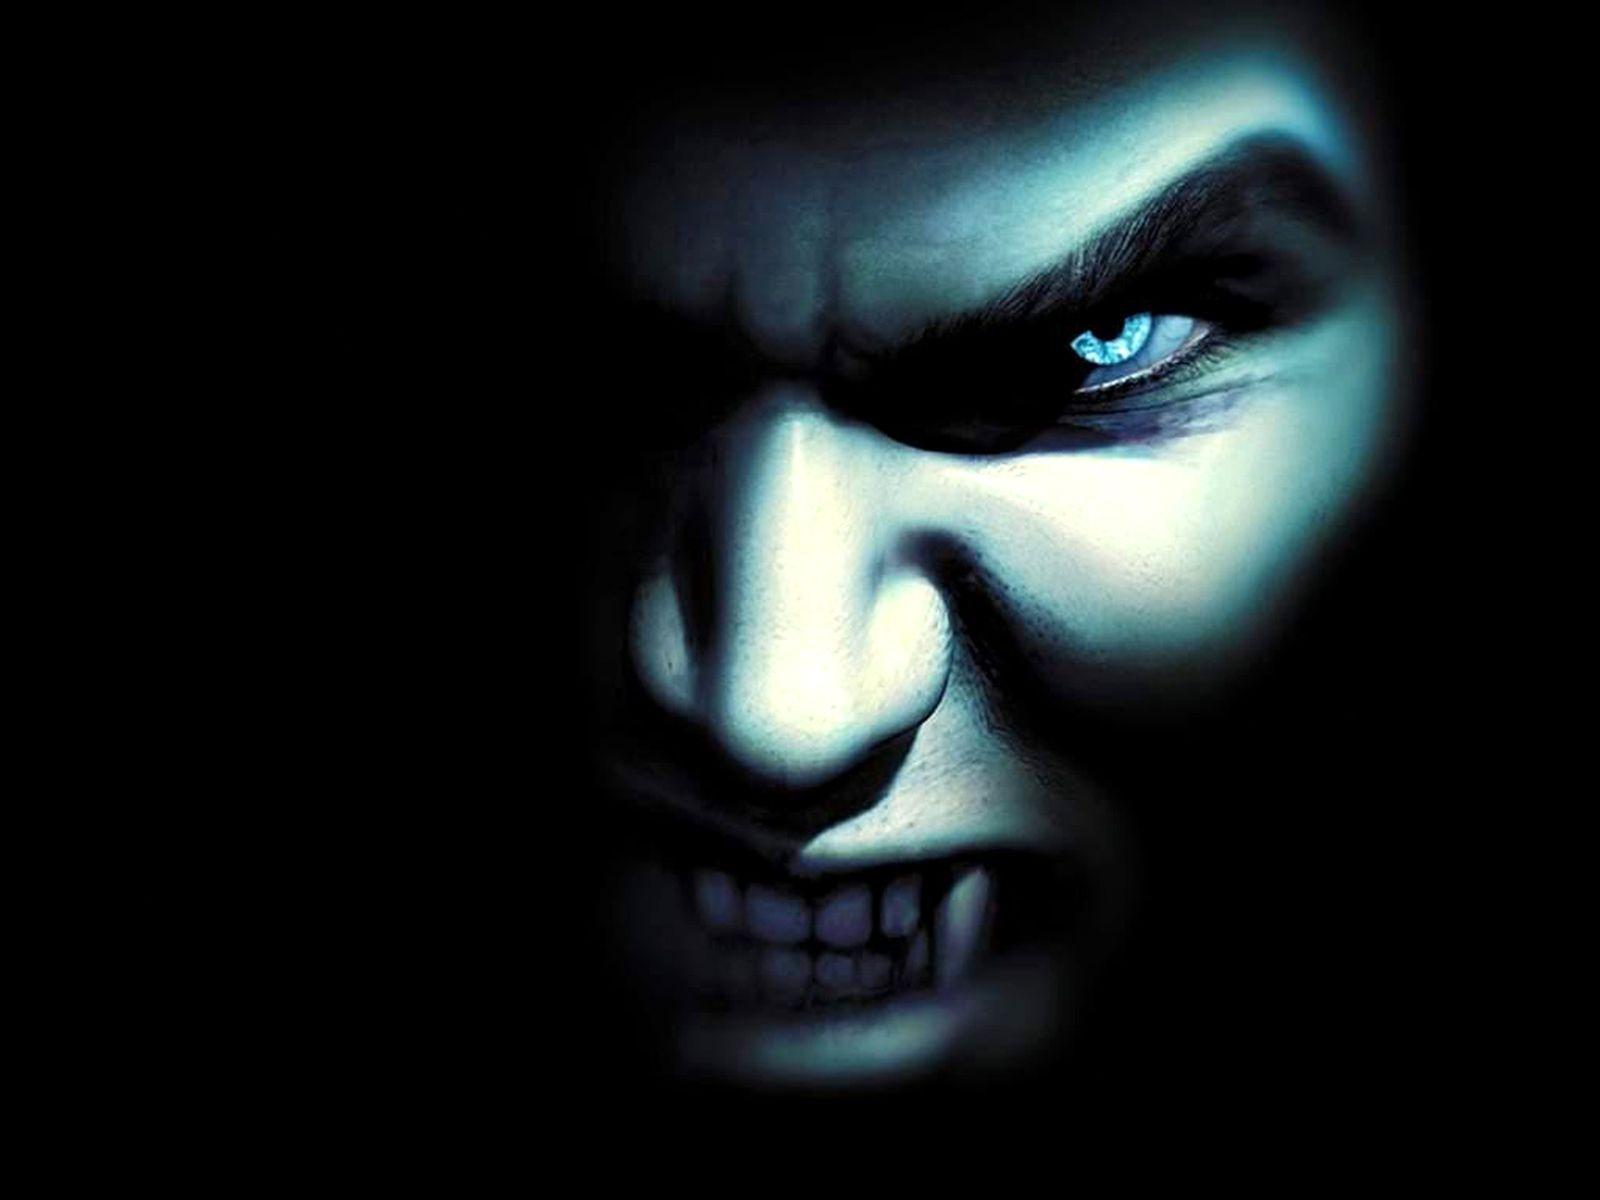 Amazing Vampire Wallpapers Vampire Pictures Vampire Images Scary Vampire